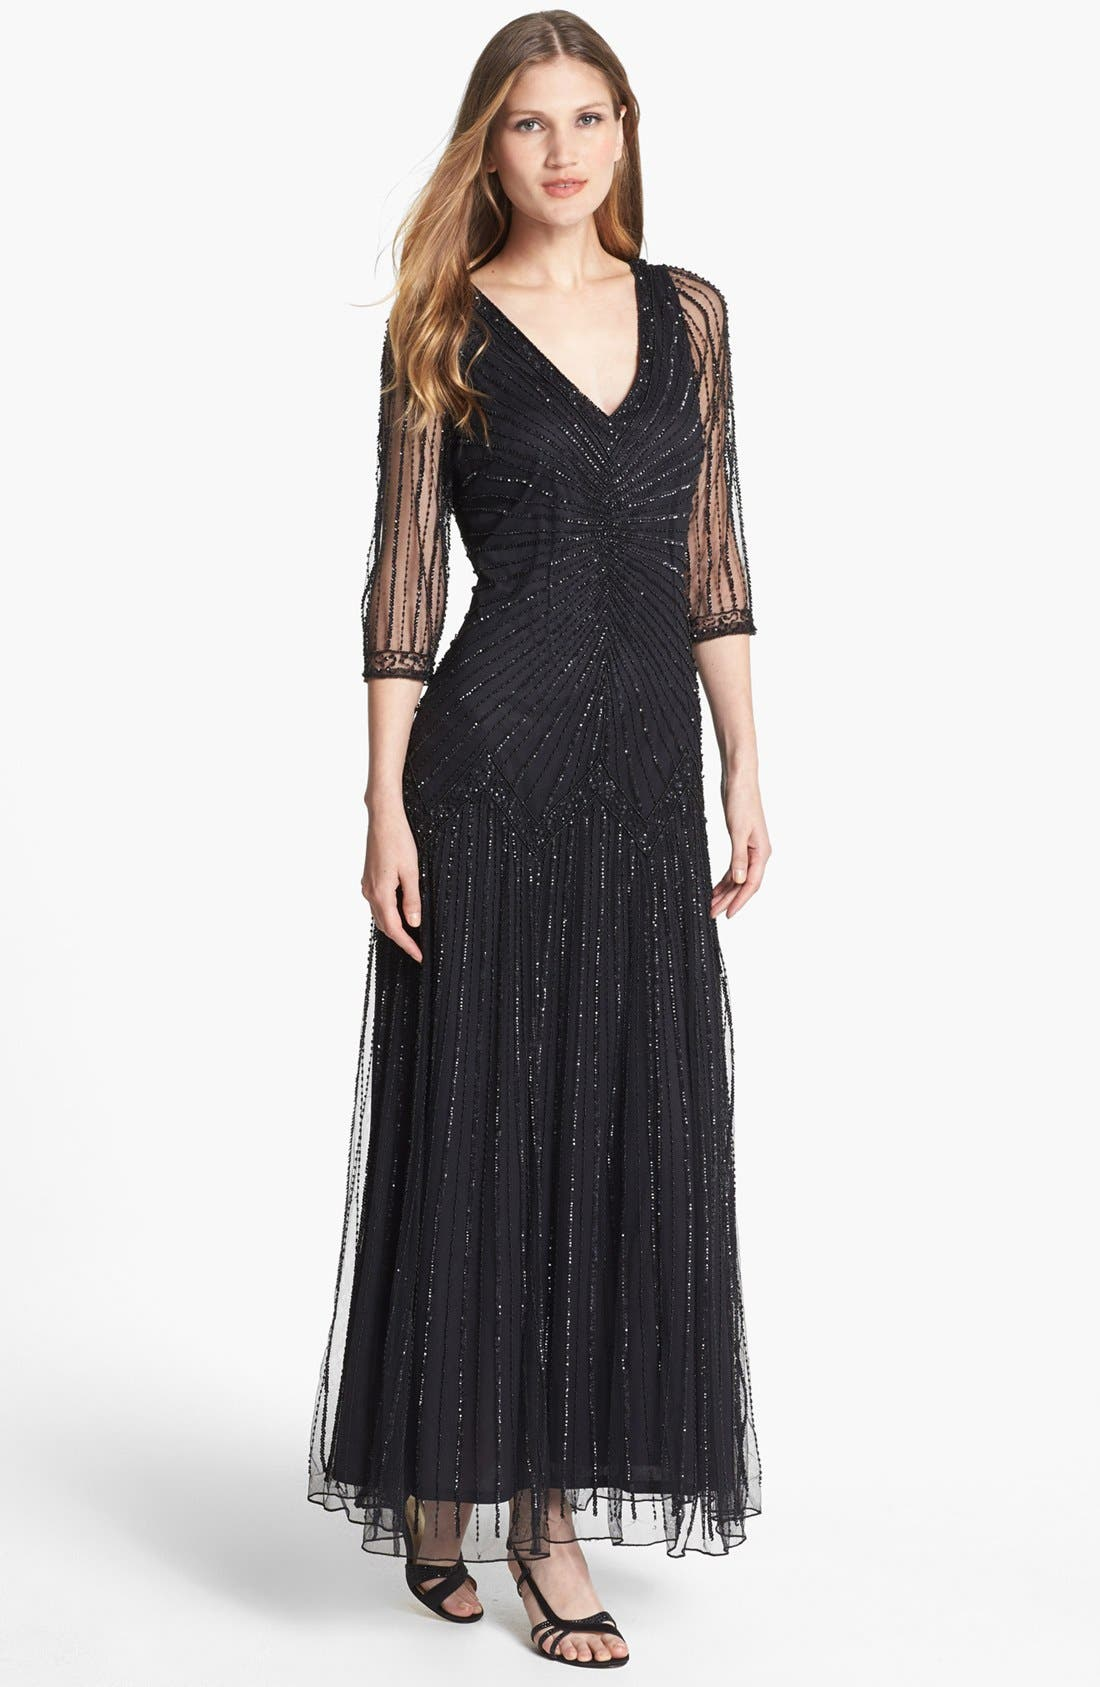 Alternate Image 1 Selected - Pisarro Nights Embellished Illusion Sleeve Mesh Gown